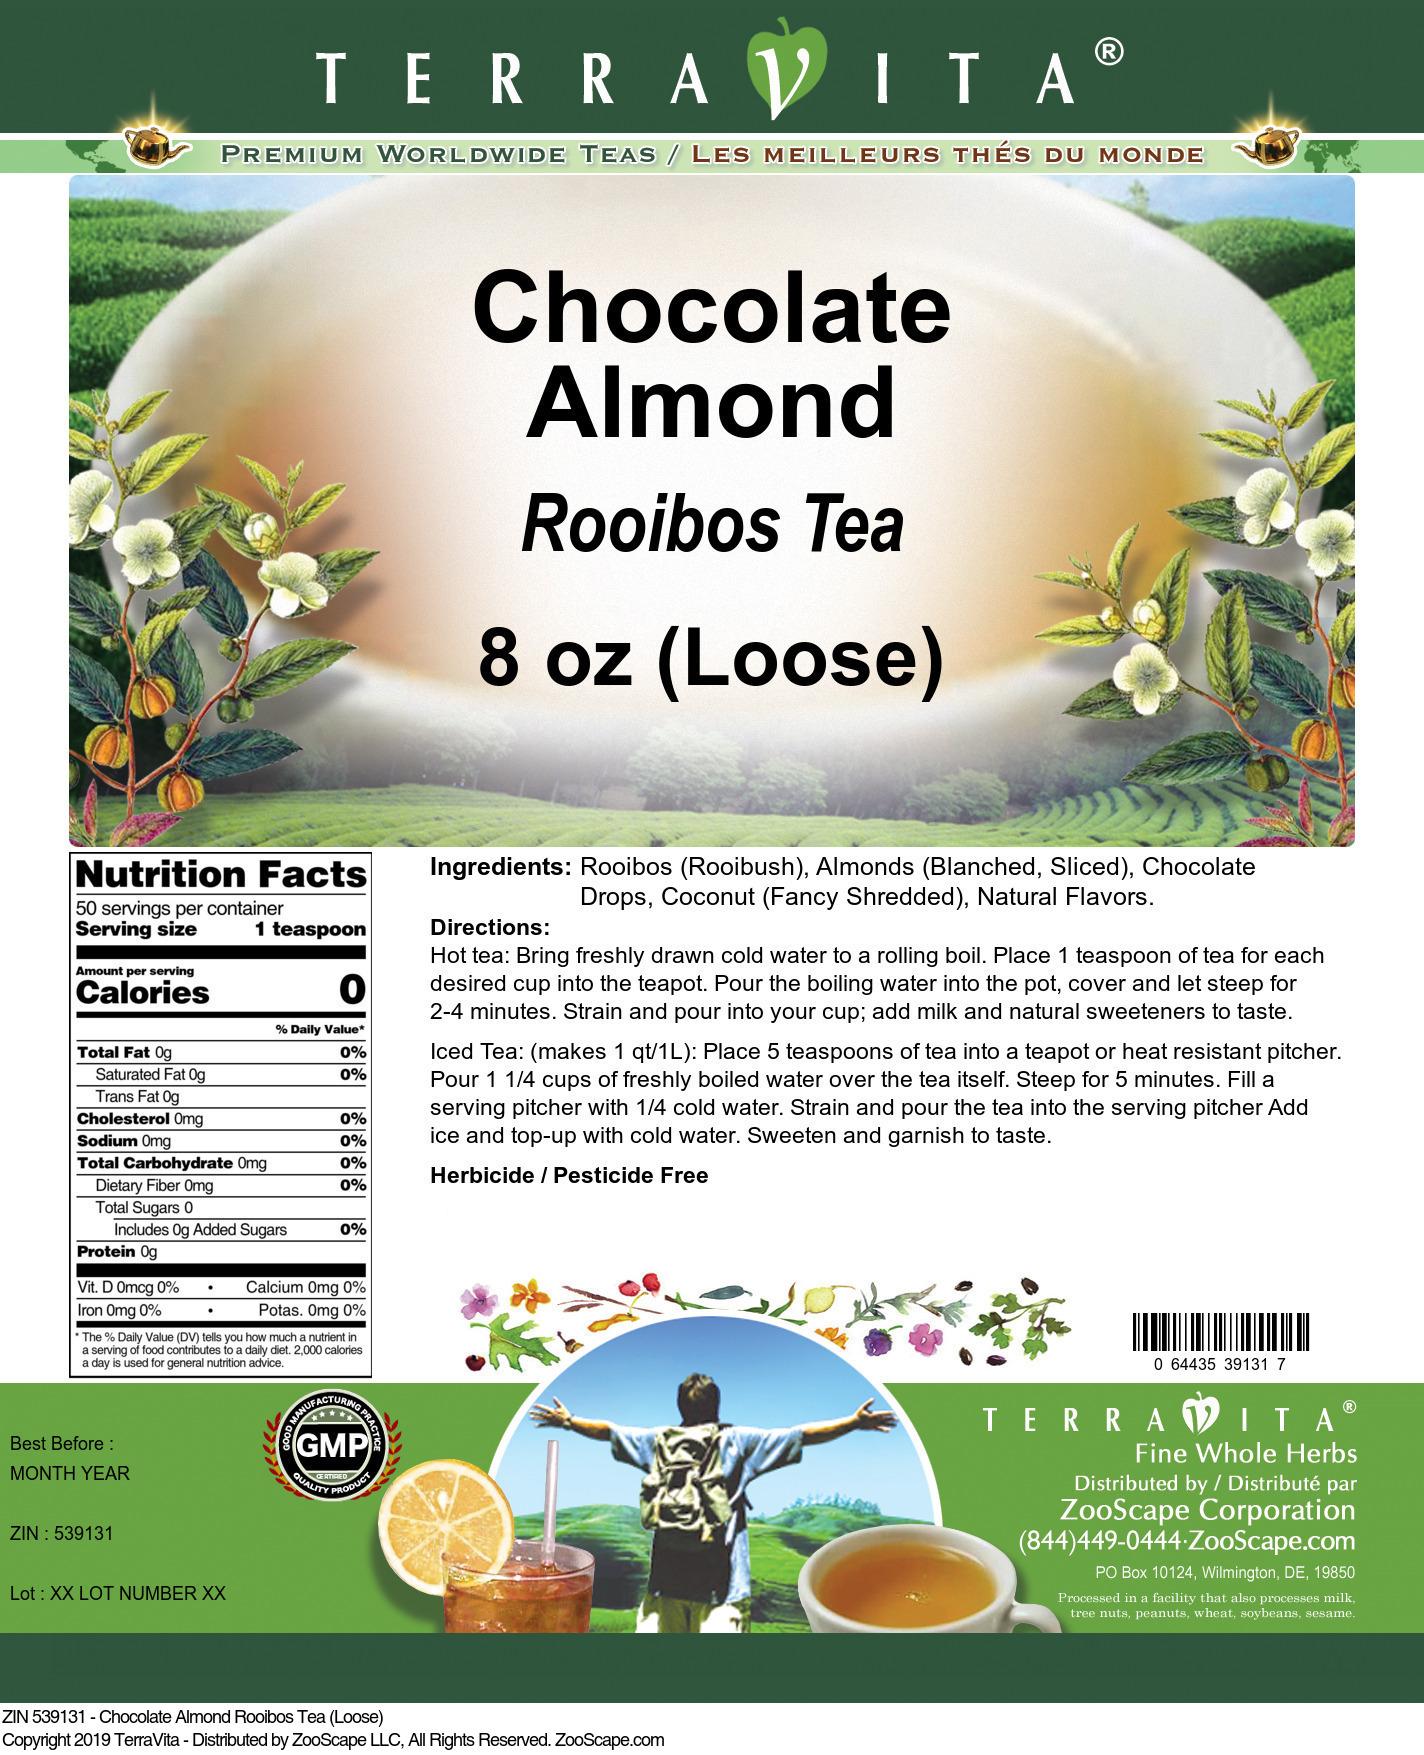 Chocolate Almond Rooibos Tea (Loose)